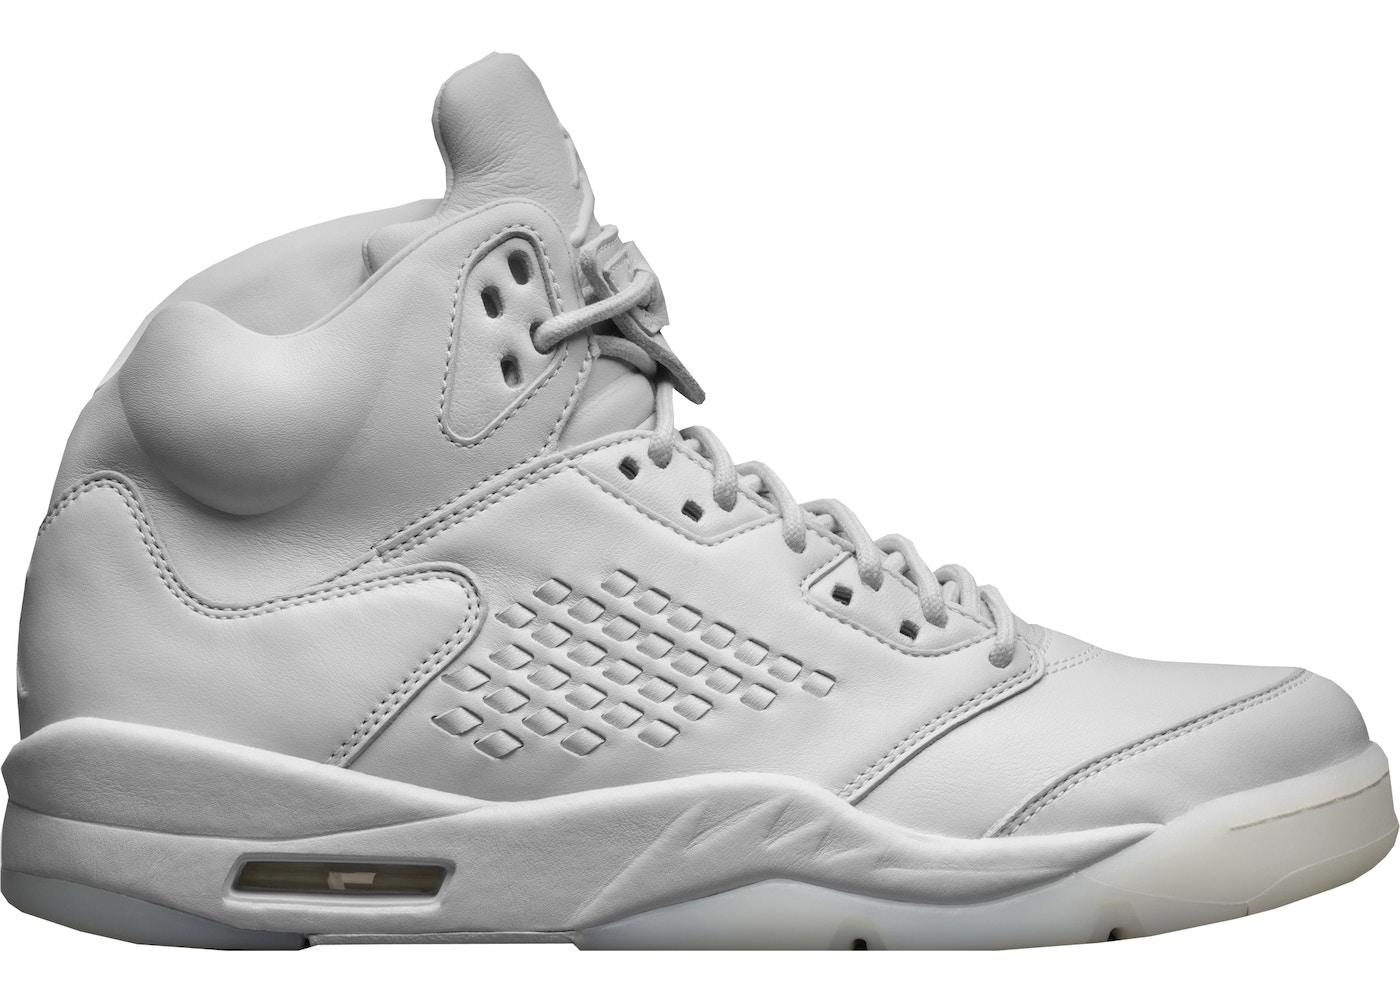 Buy Air Jordan 5 Shoes   Deadstock Sneakers d876a0de42